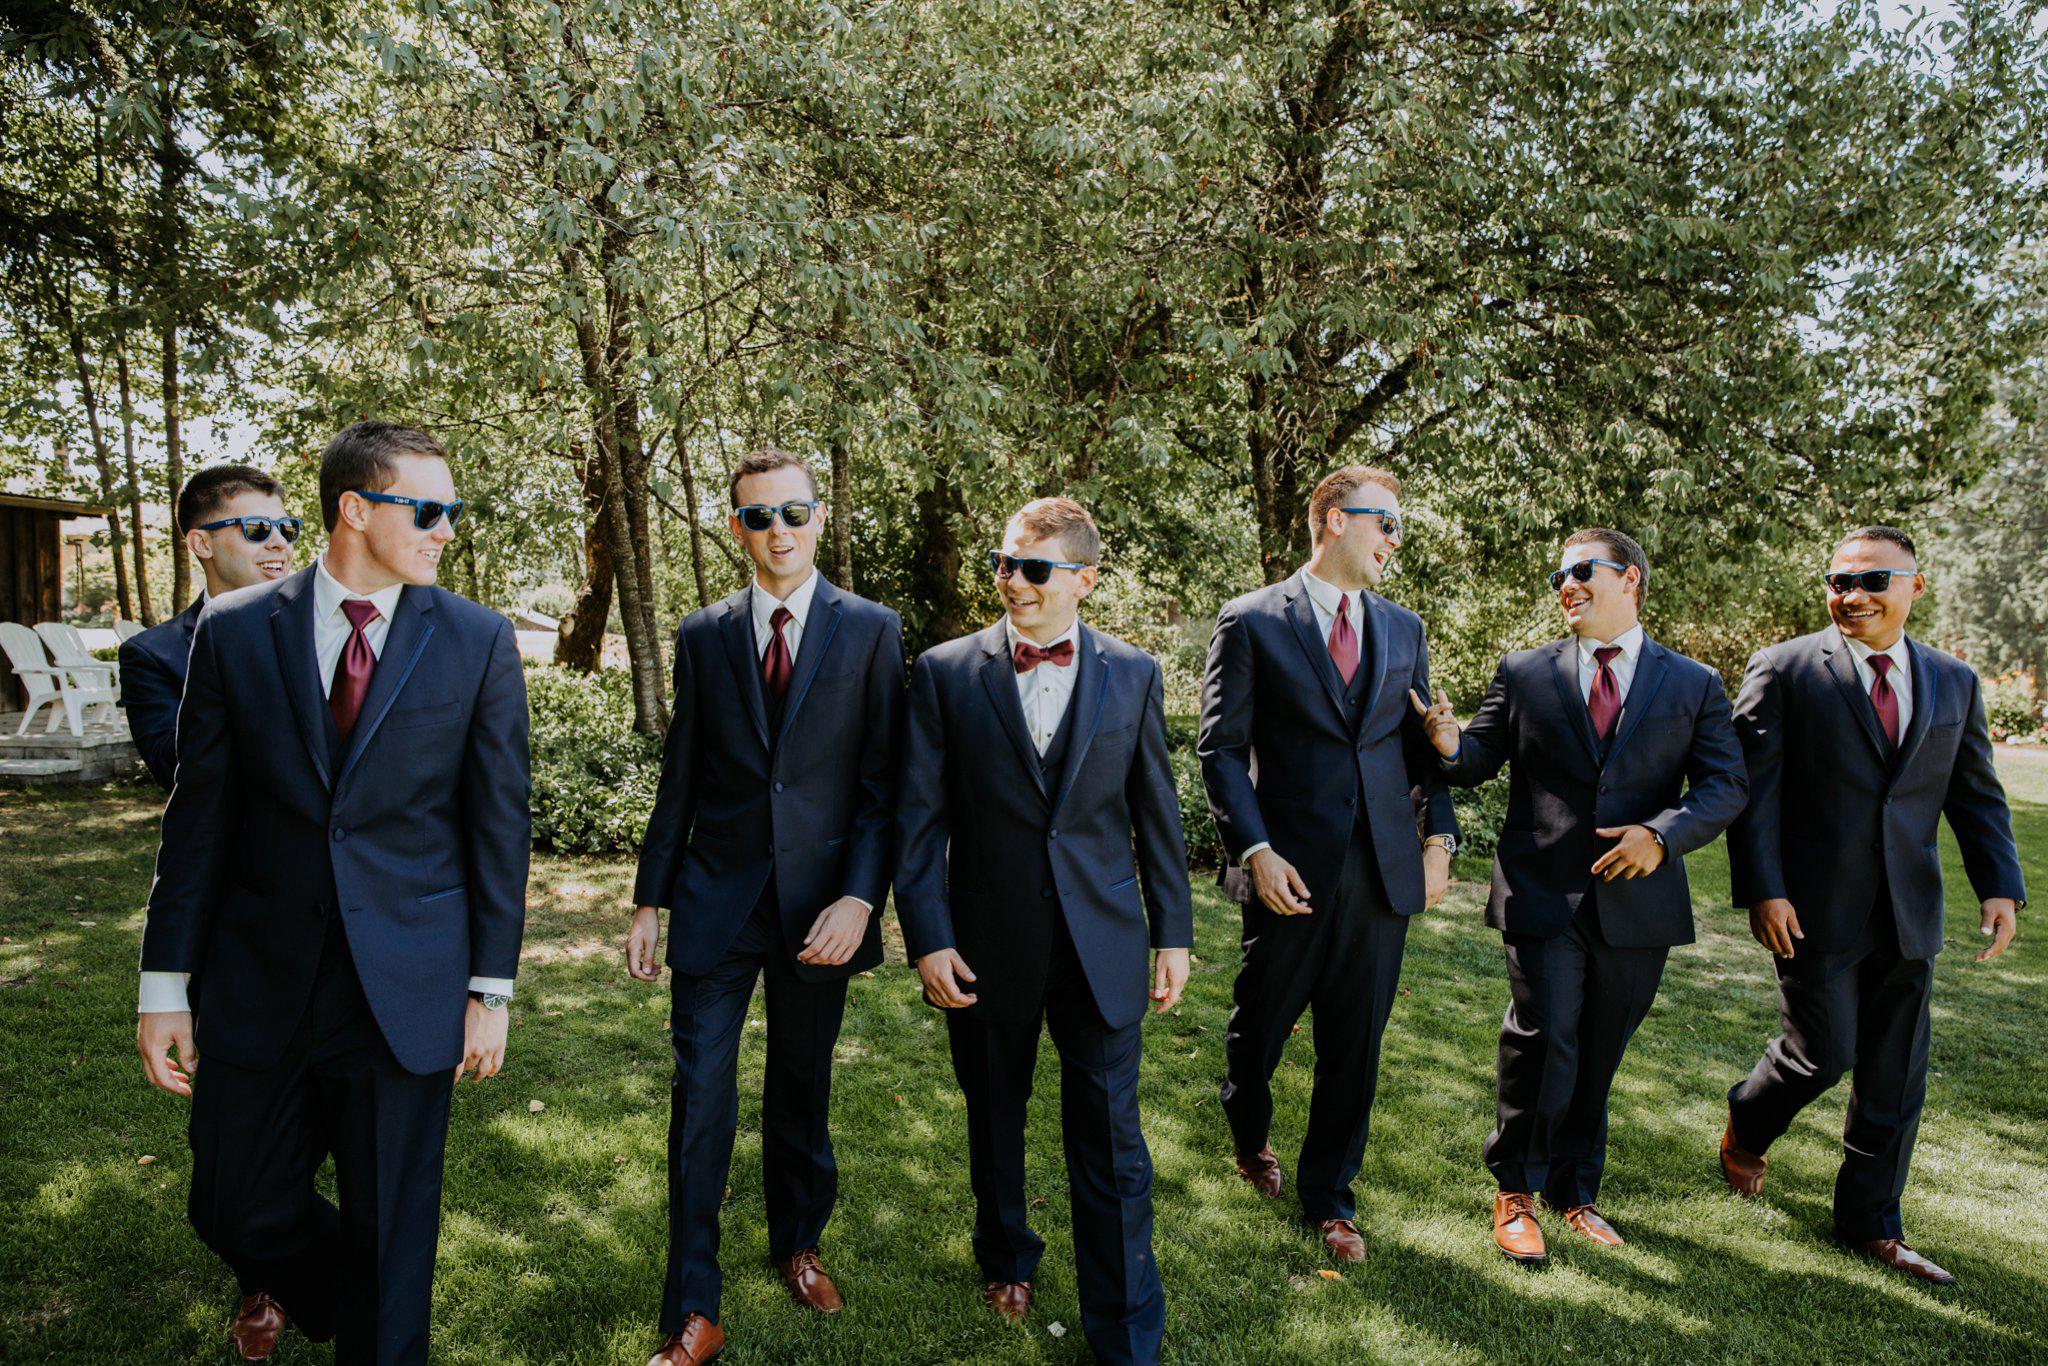 kristen-and-cody-the-kelley-farm-wedding-seattle-photographer-caitlyn-nikula-40.jpg